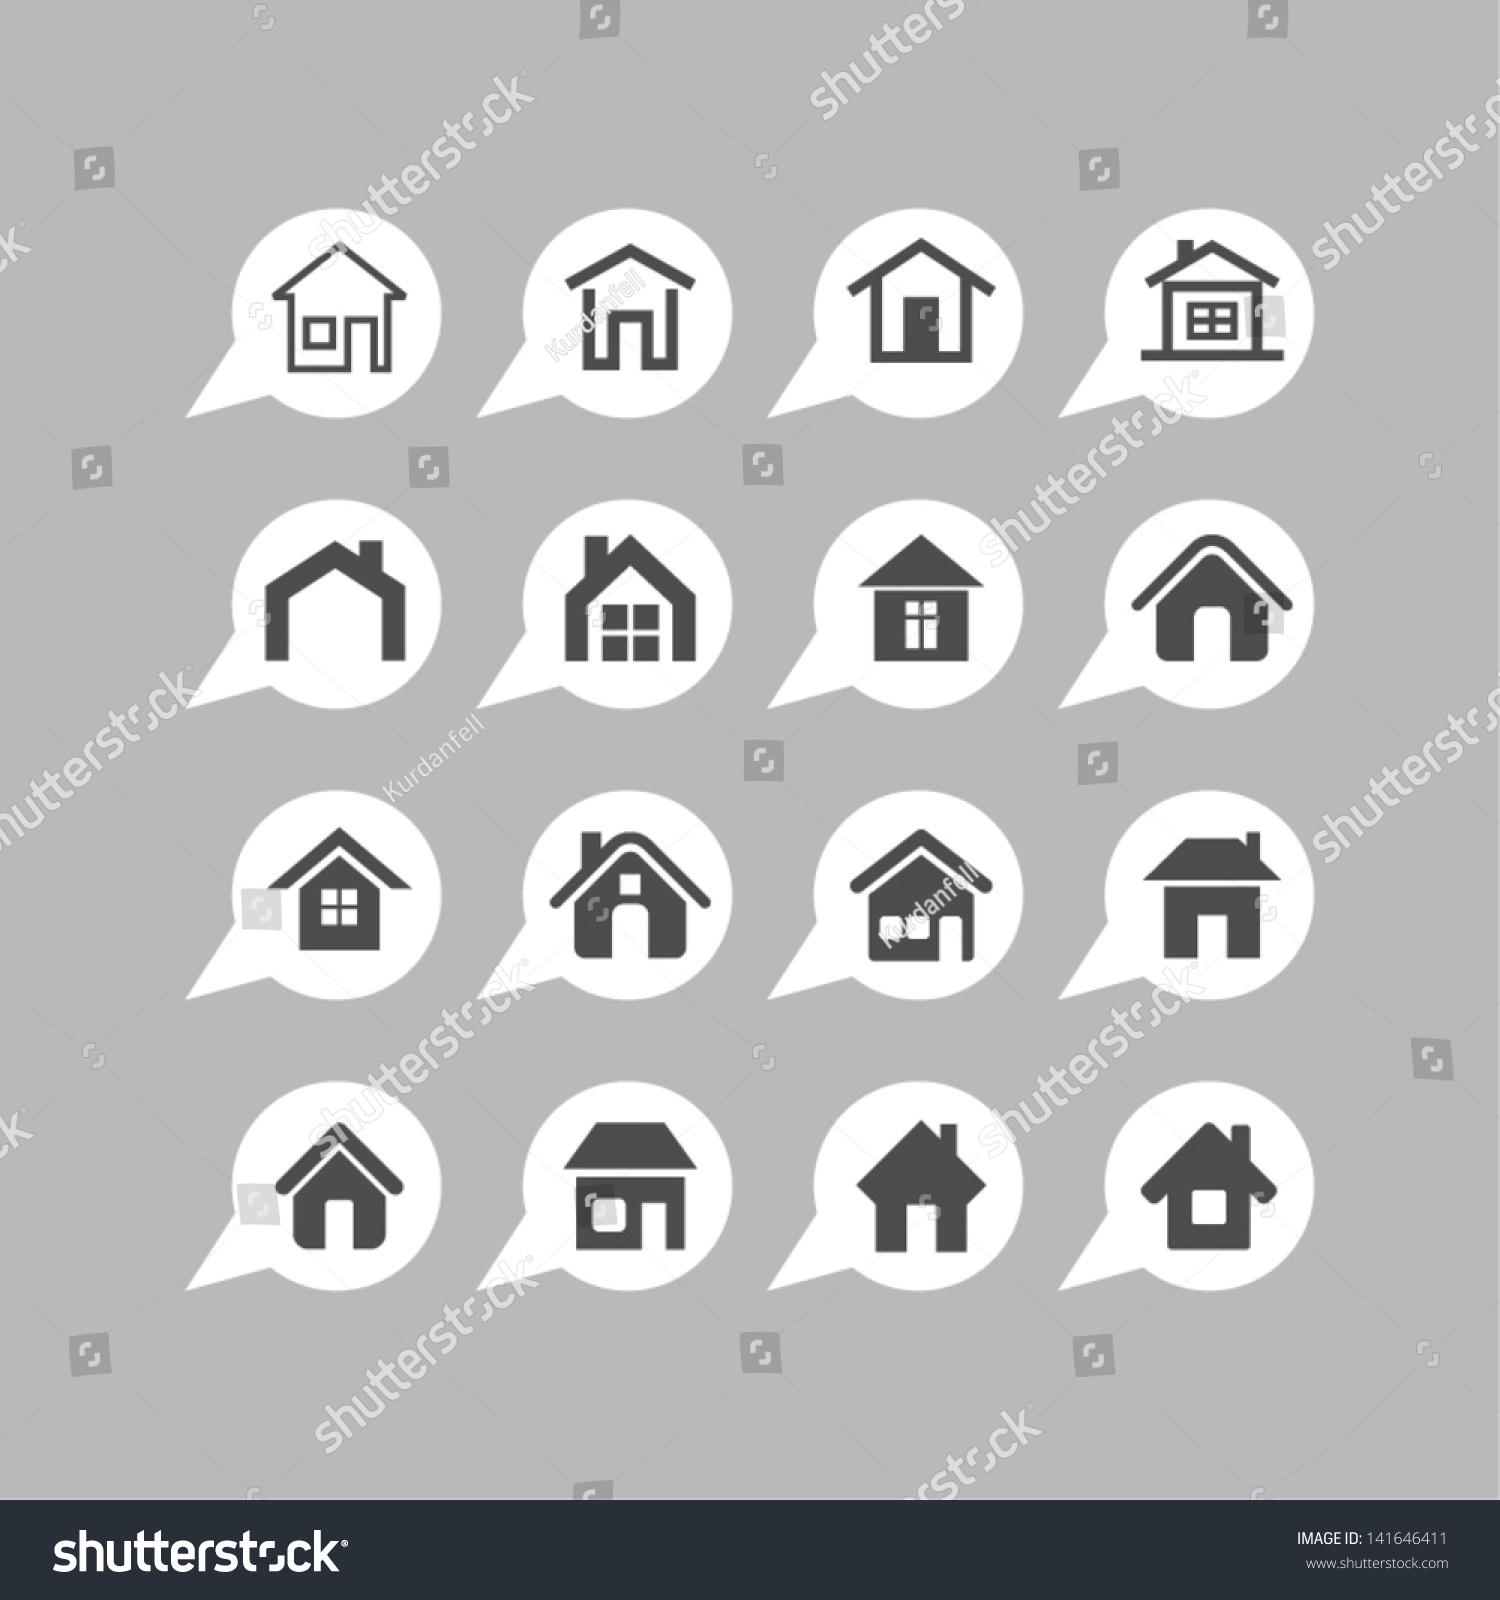 Home Design Icons Stock Vector 141646411 - Shutterstock